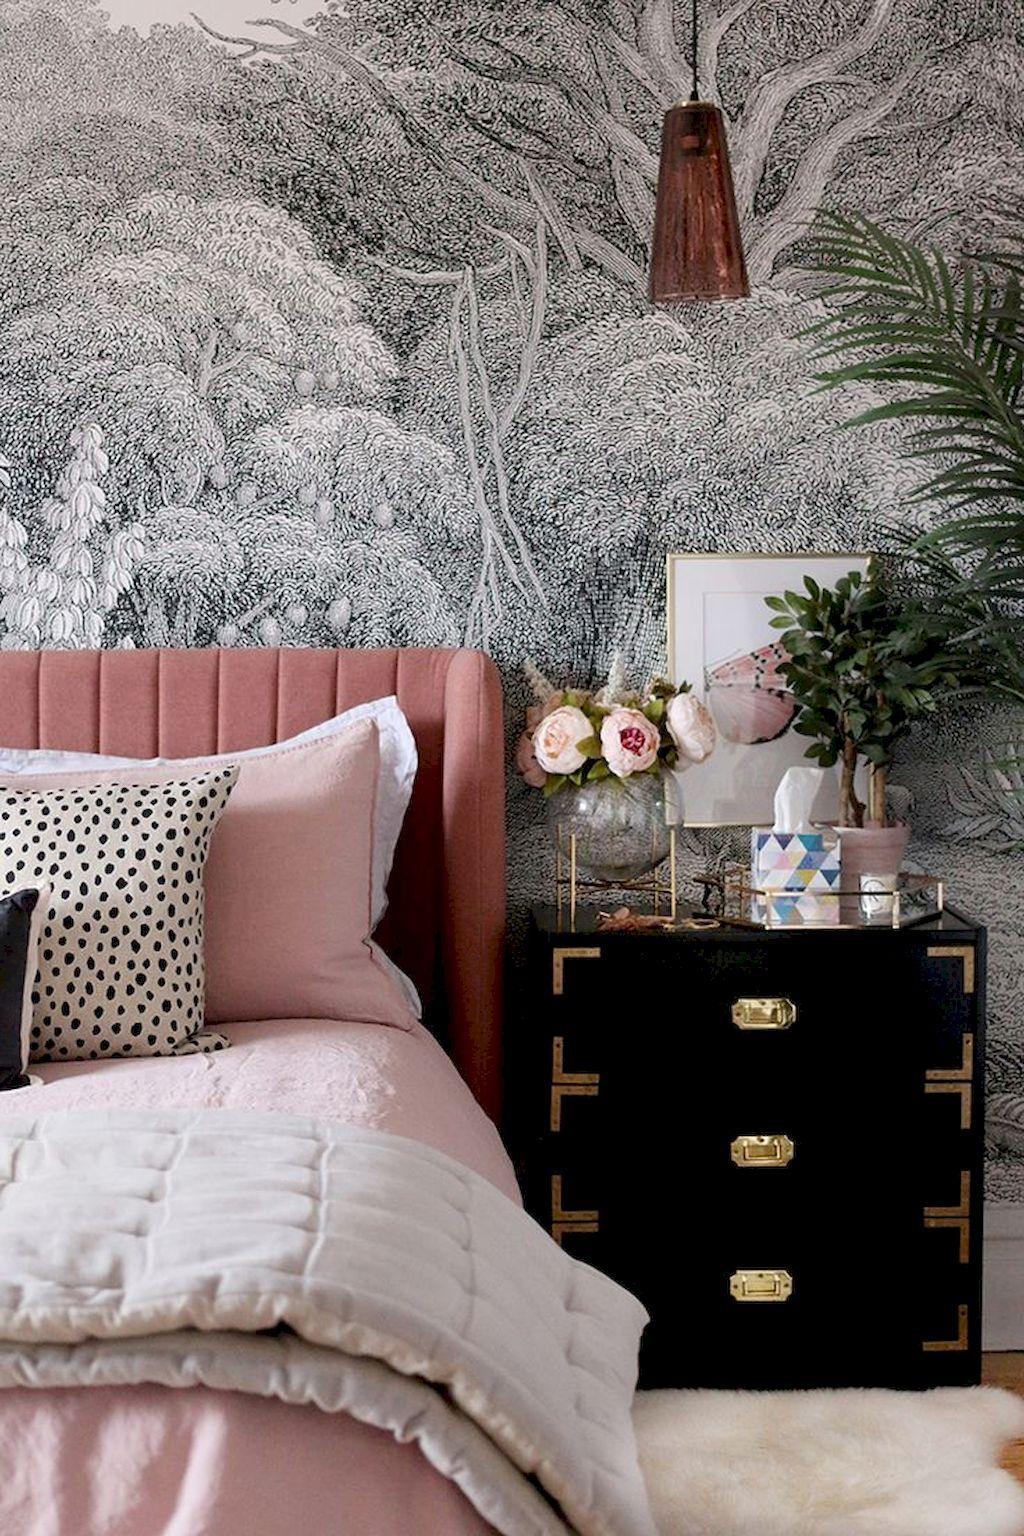 Bed room Wall Decor Enjoyable Step For Your Distinctive